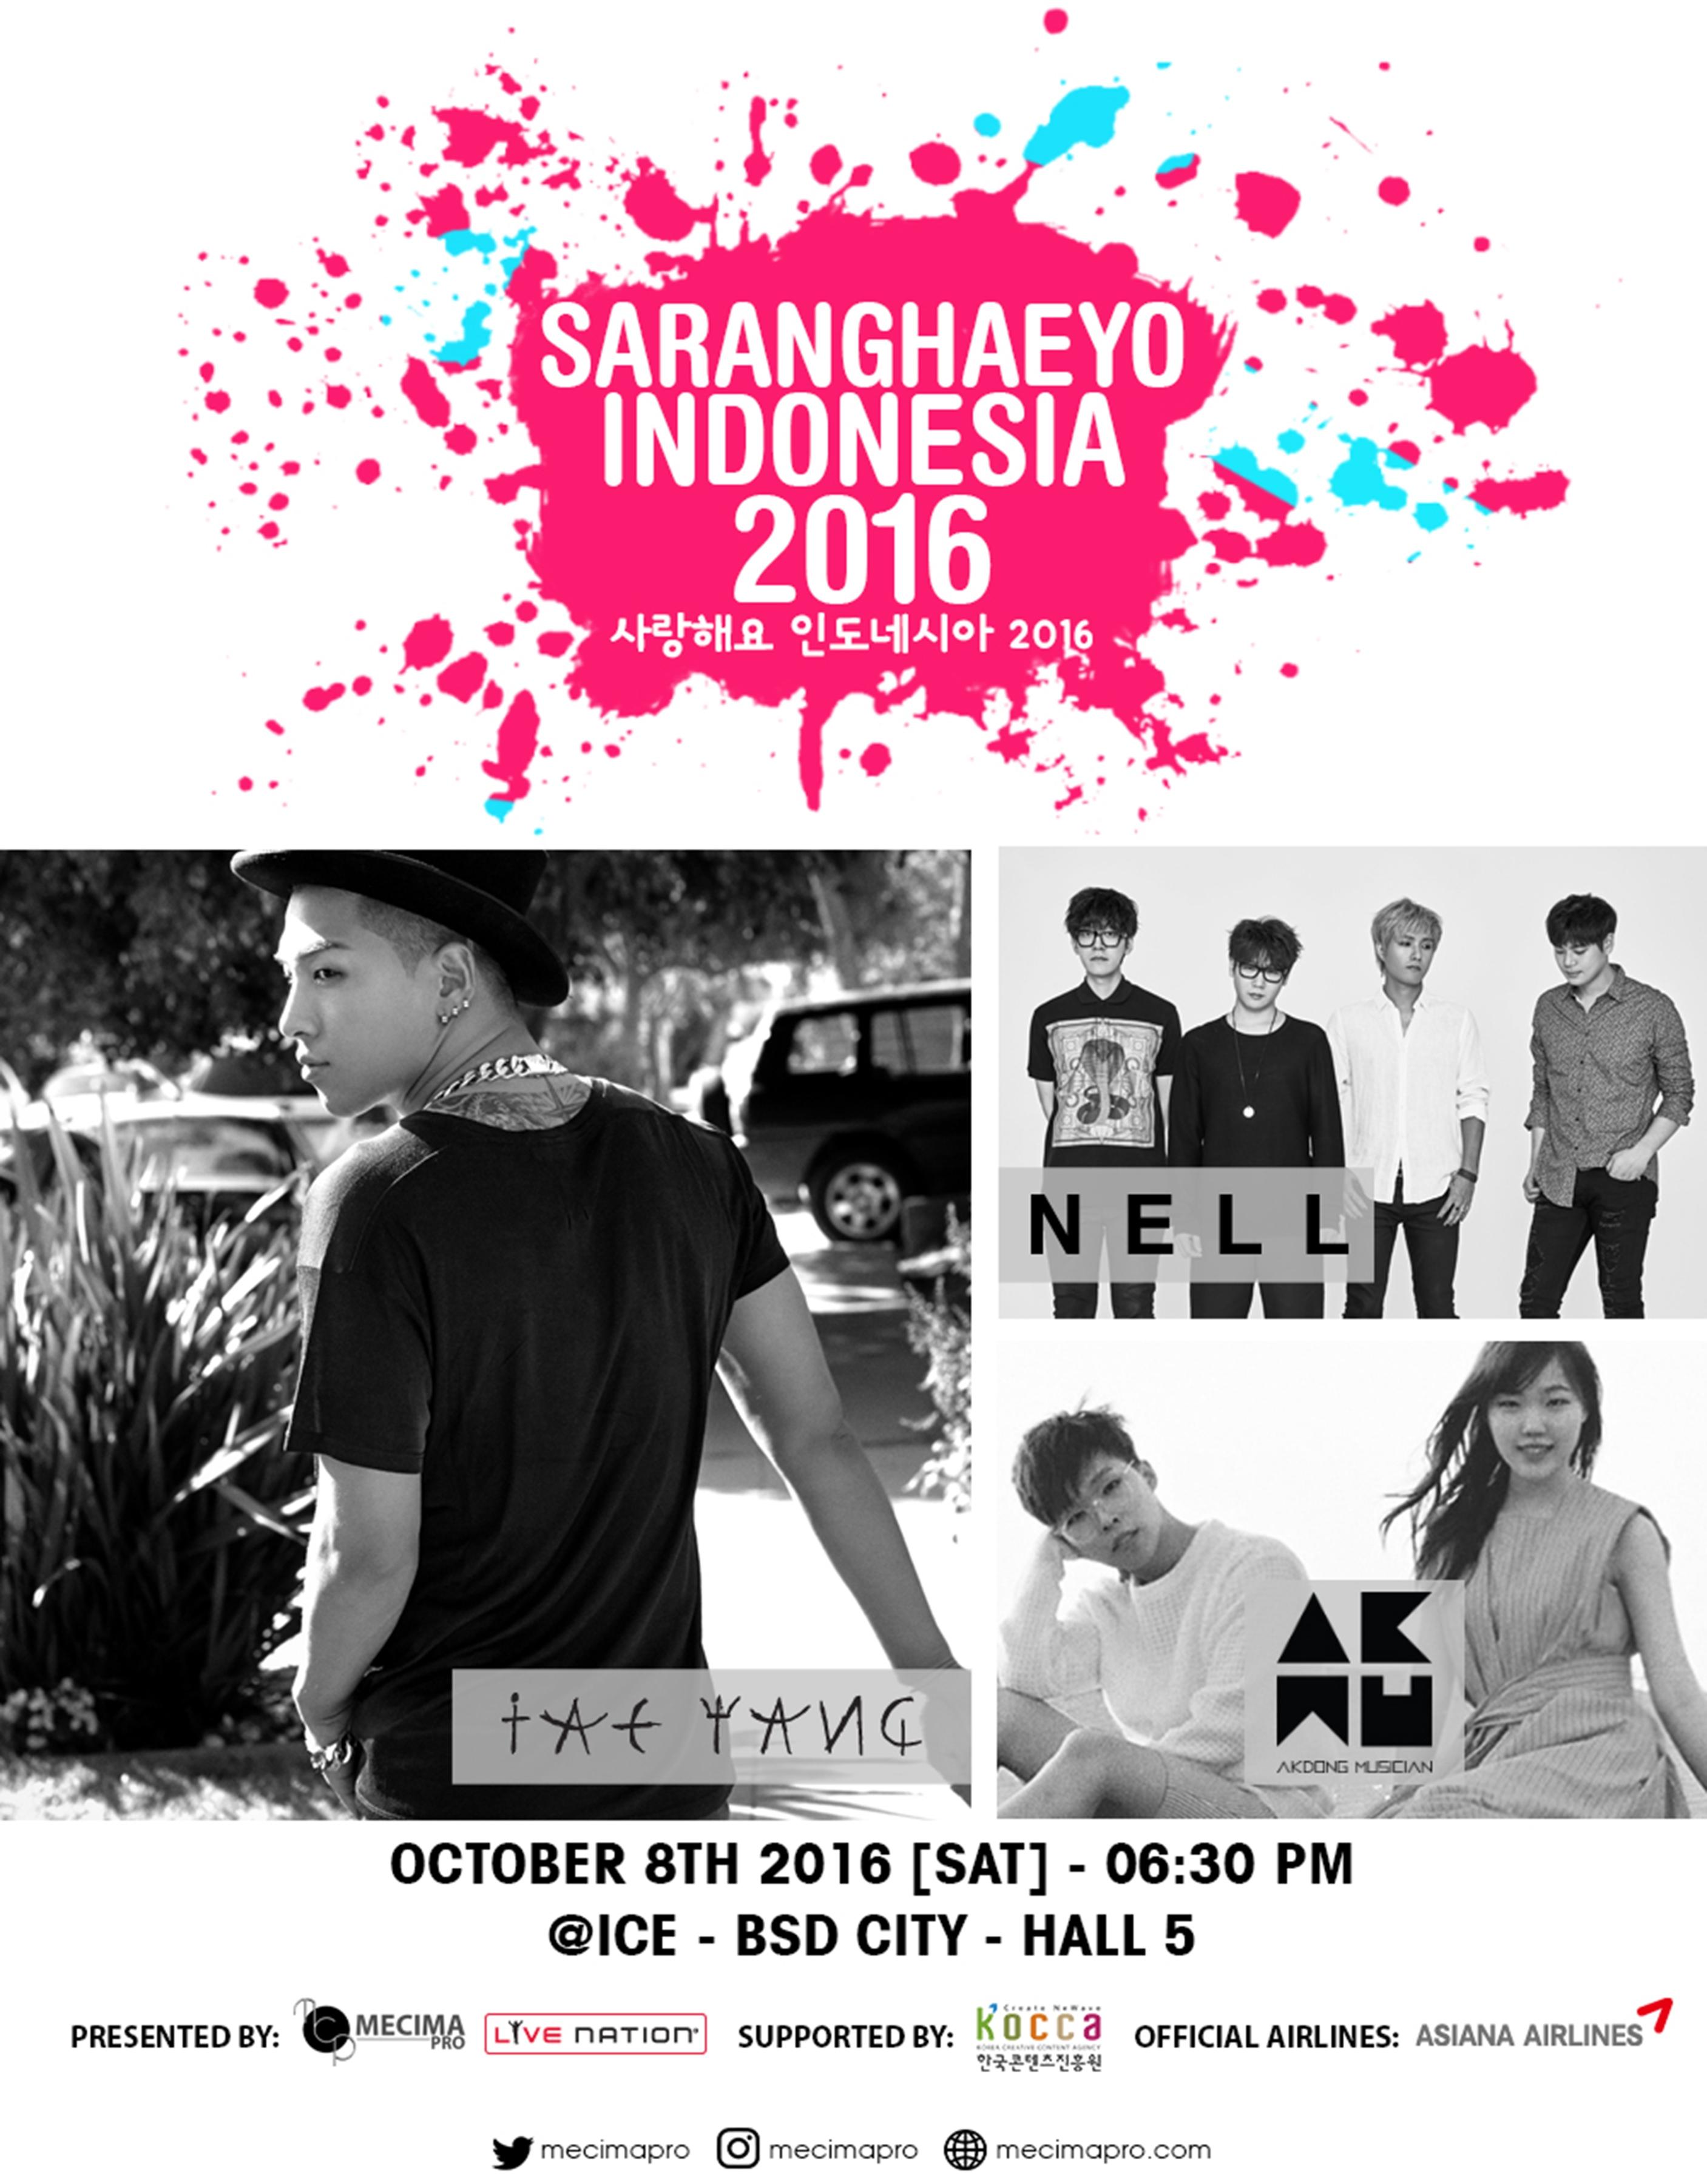 Saranghaeyo Indonesia 2